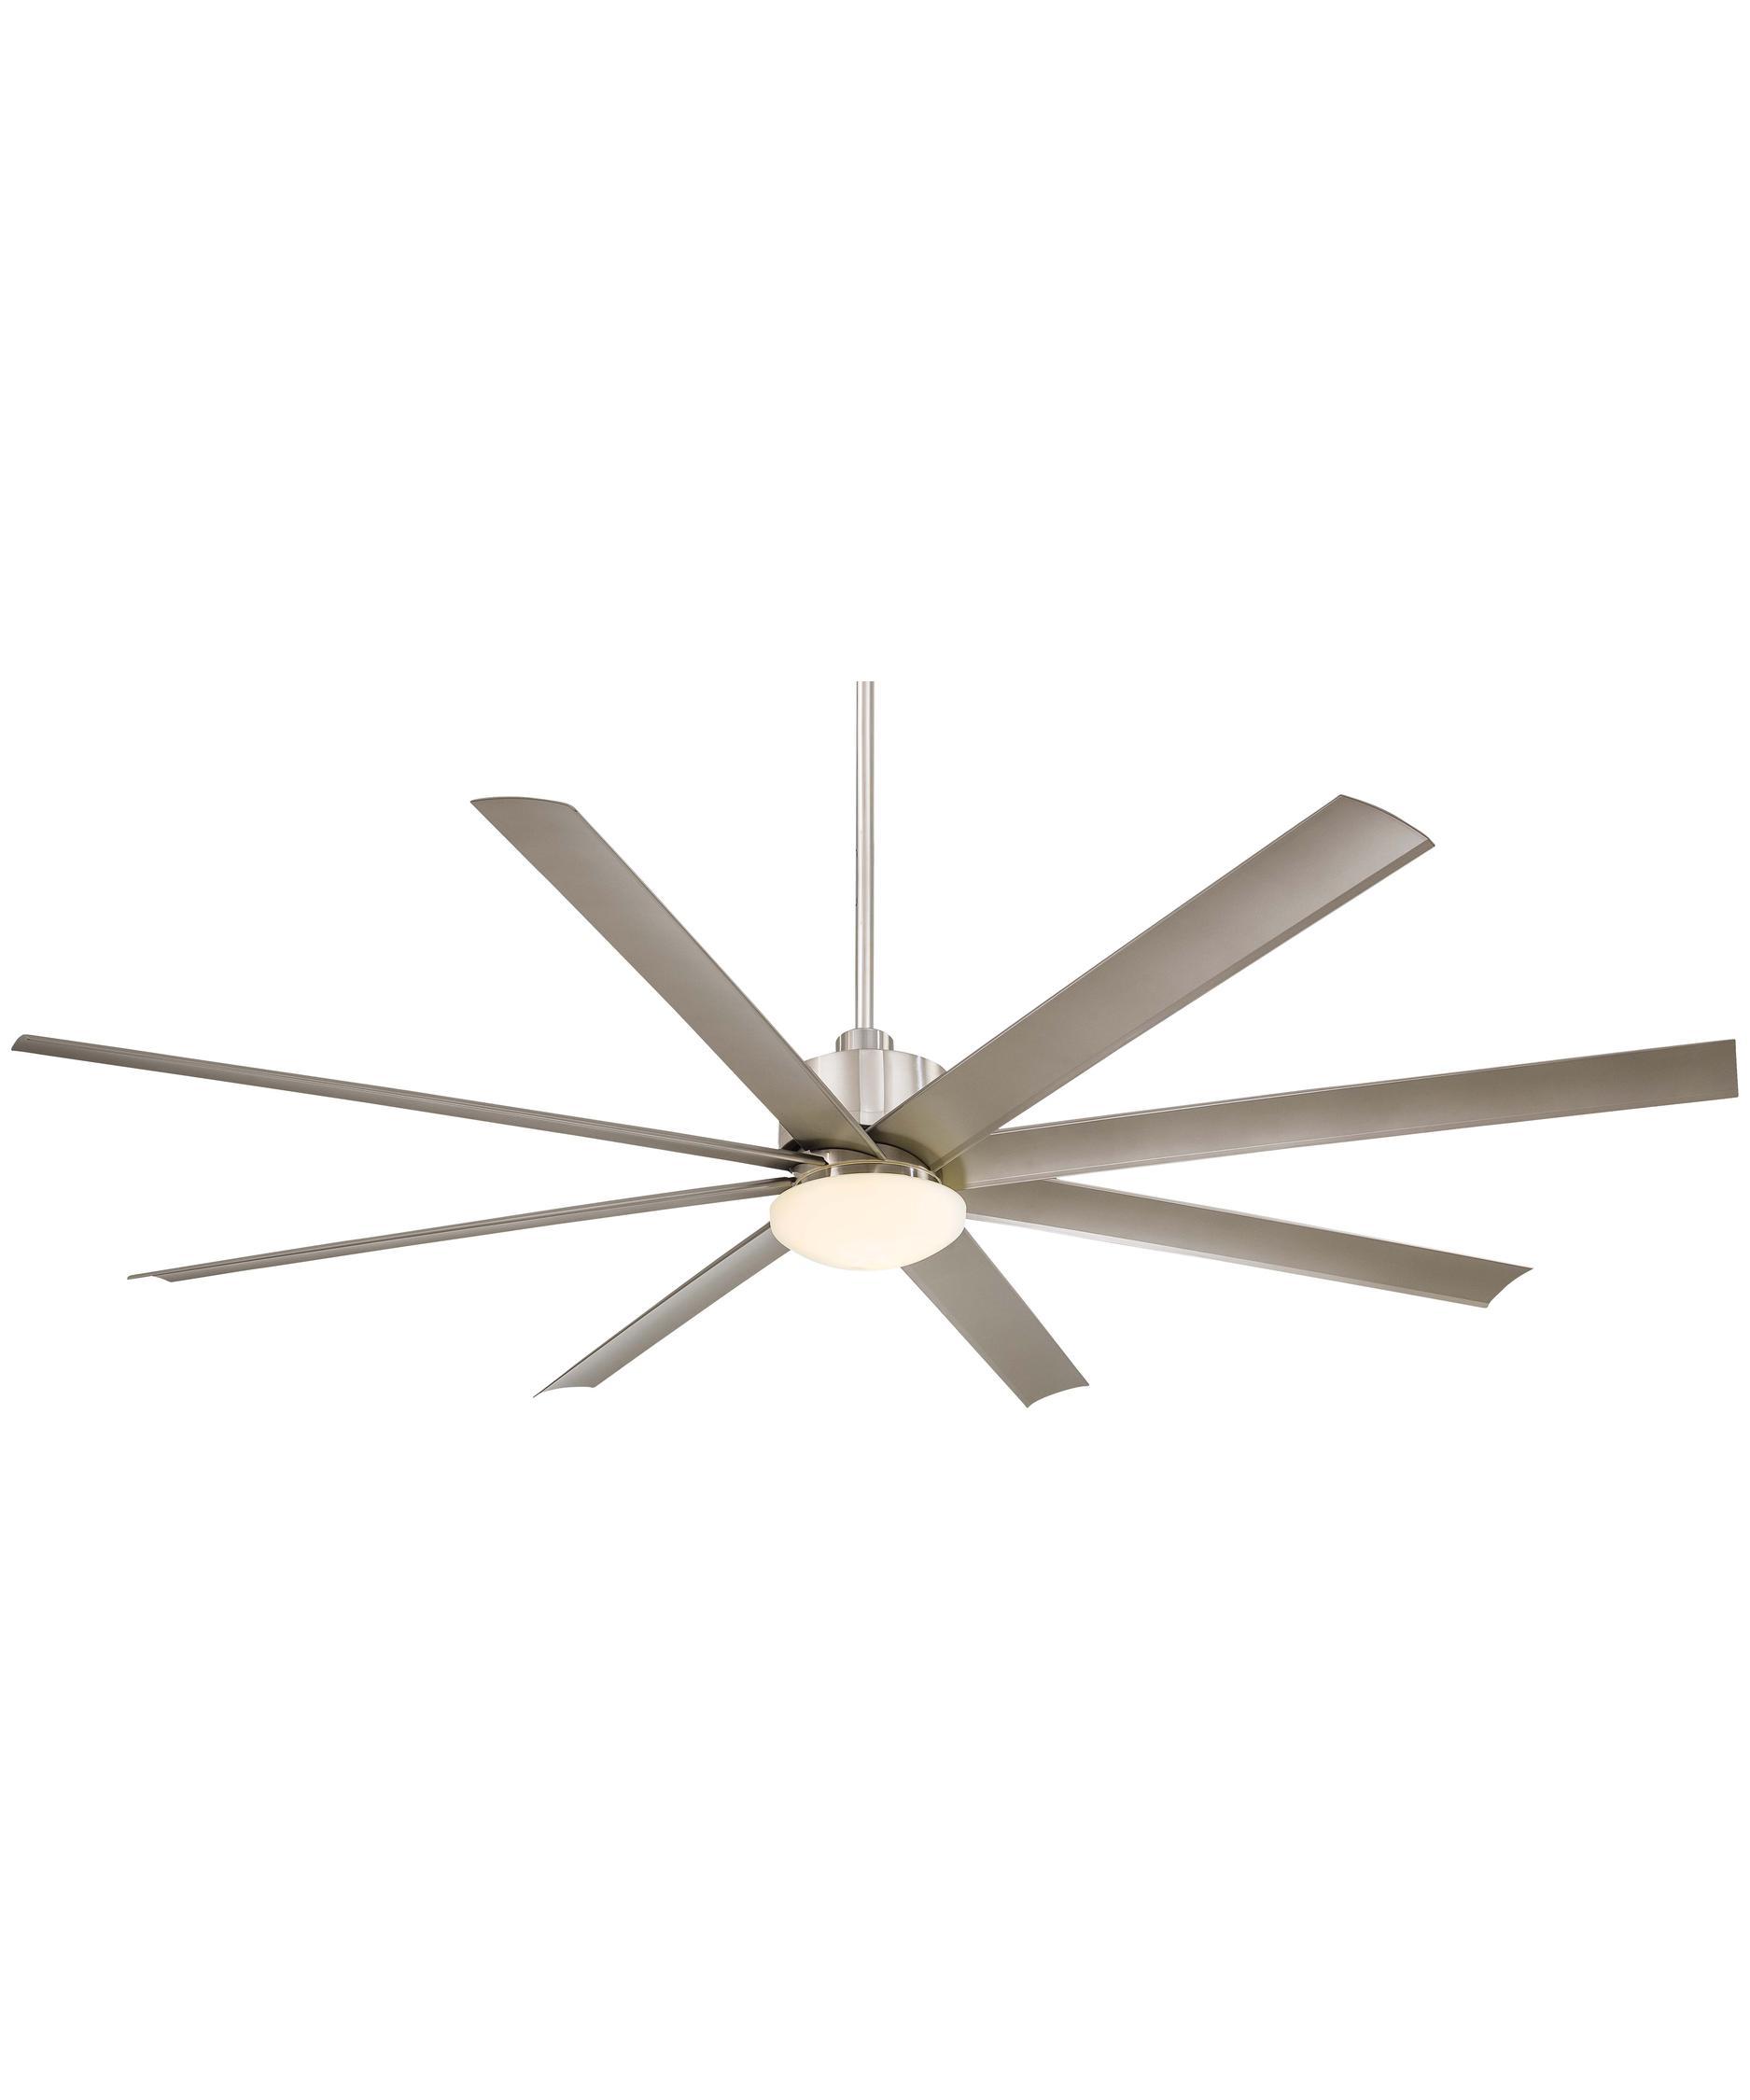 minka aire f889 slipstream xxl 84 inch 8 blade ceiling fan